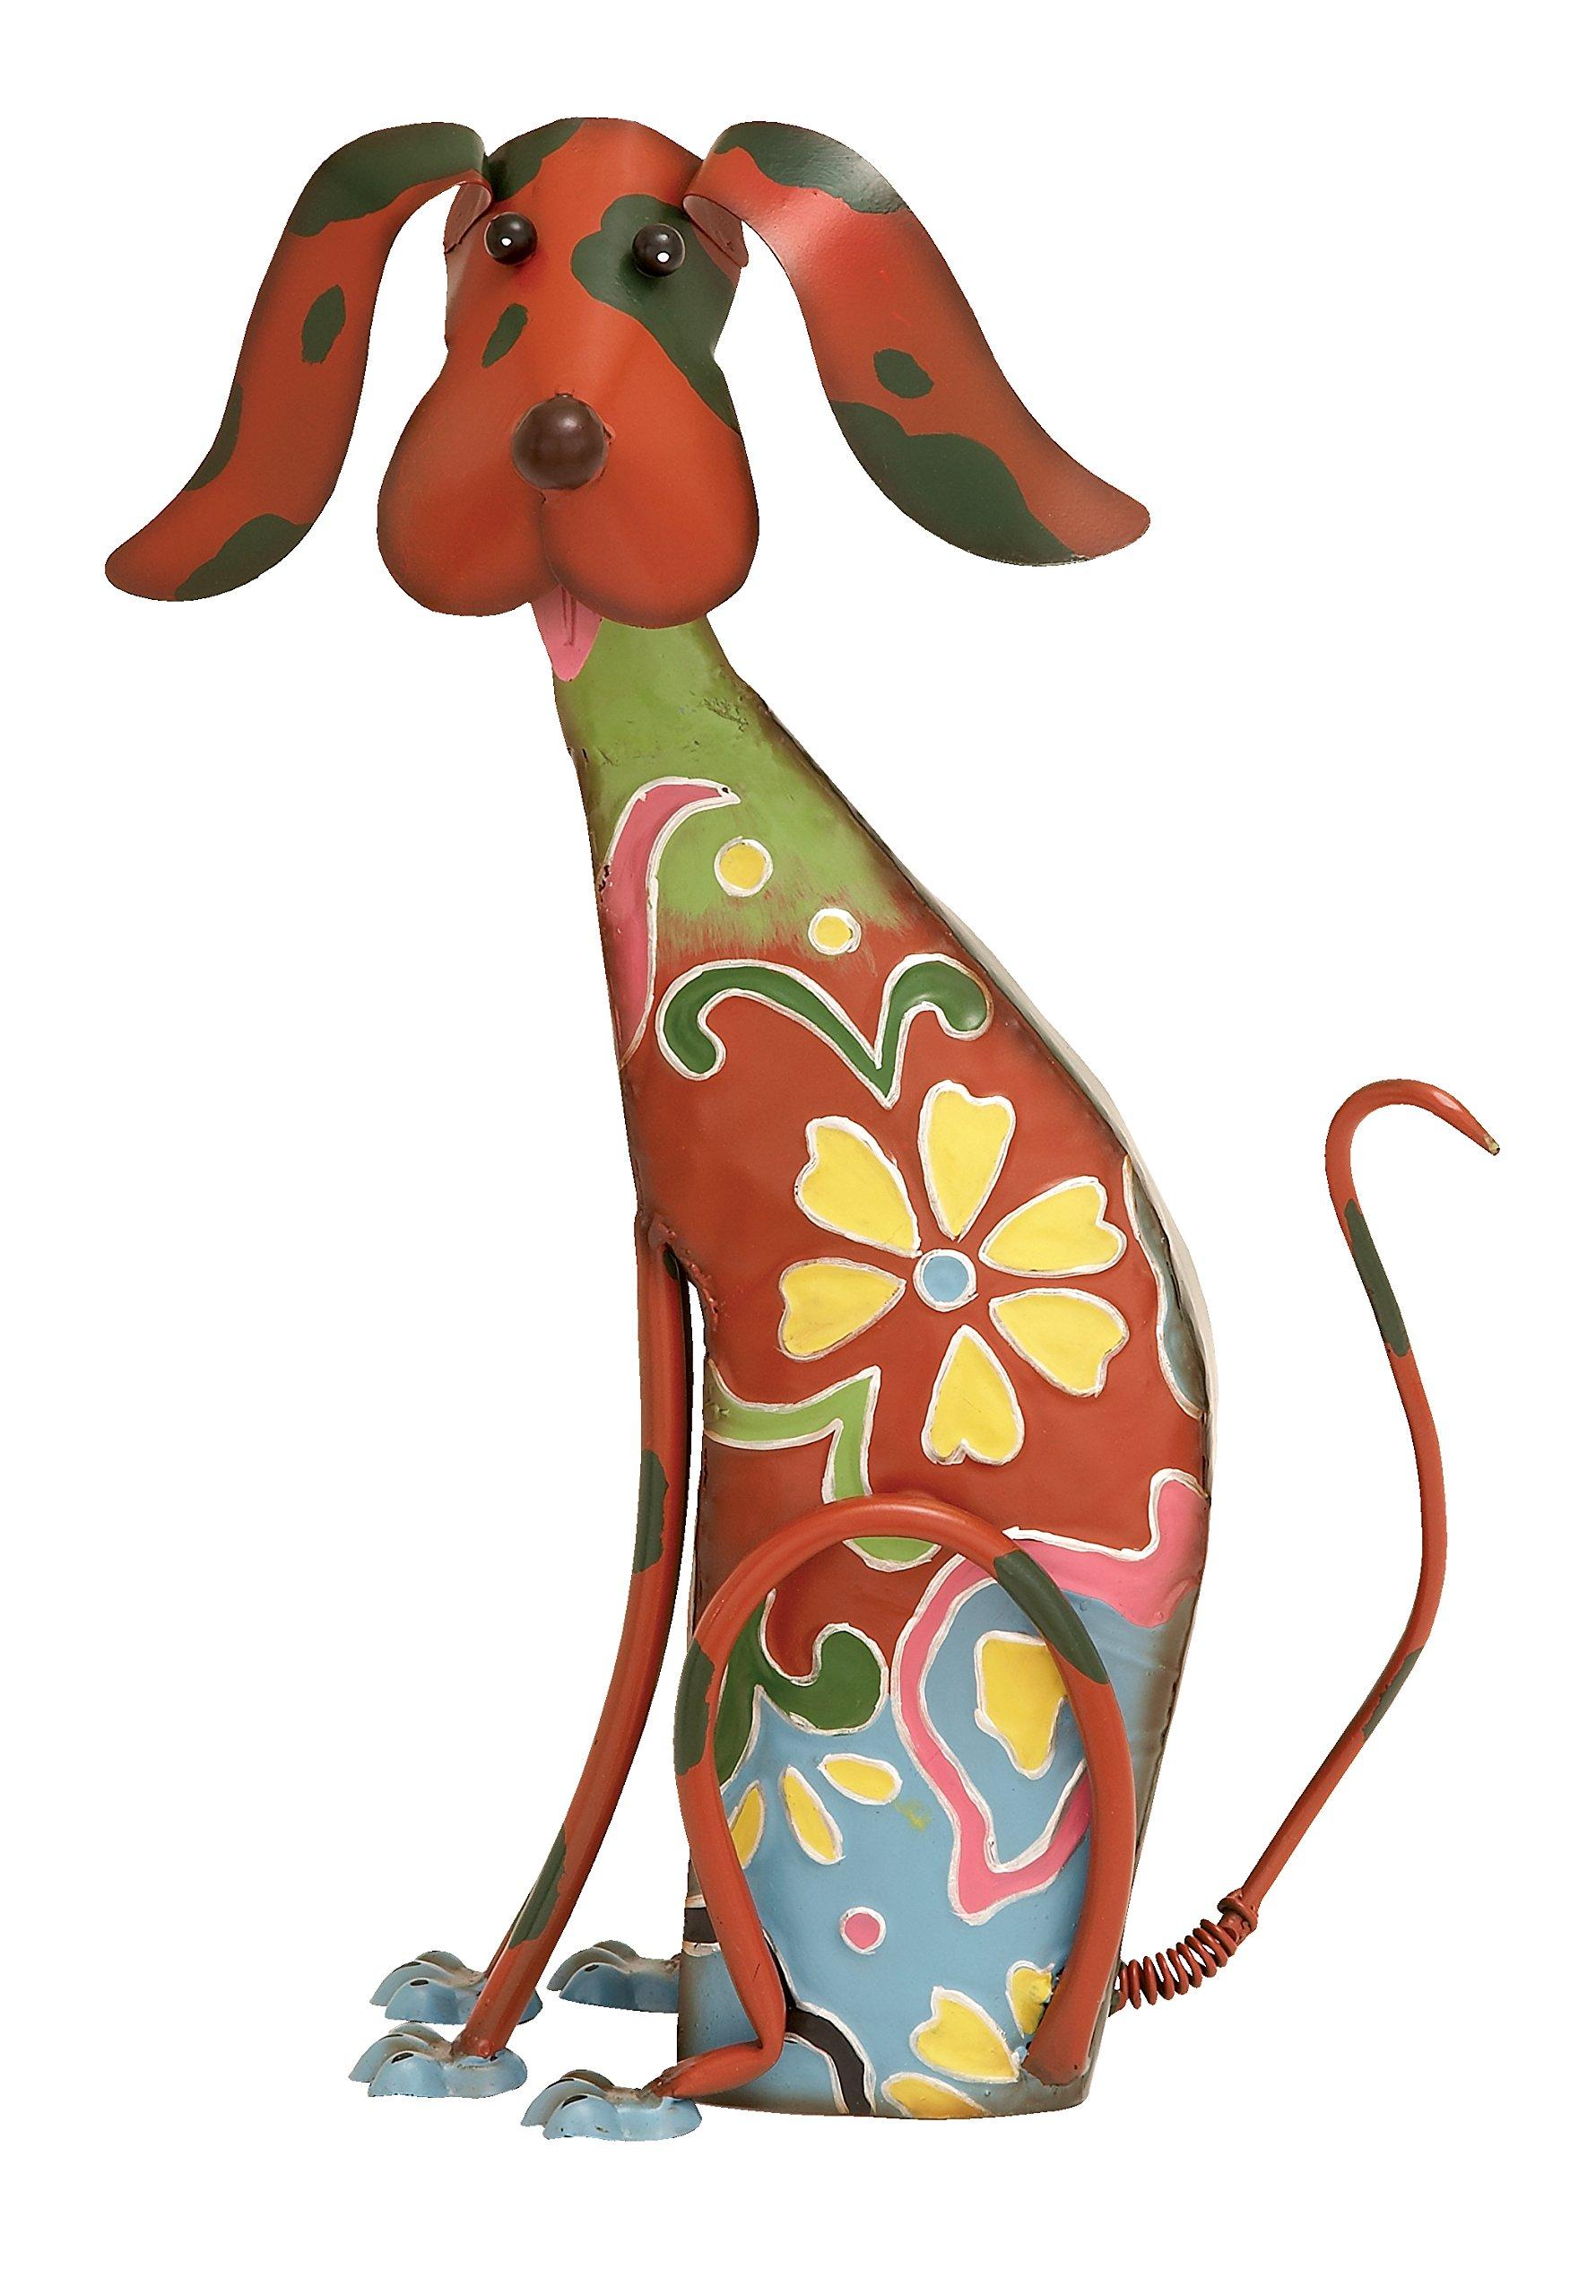 Deco 79 55138 Metal Decorative Dog Statue, 12'' x 17''